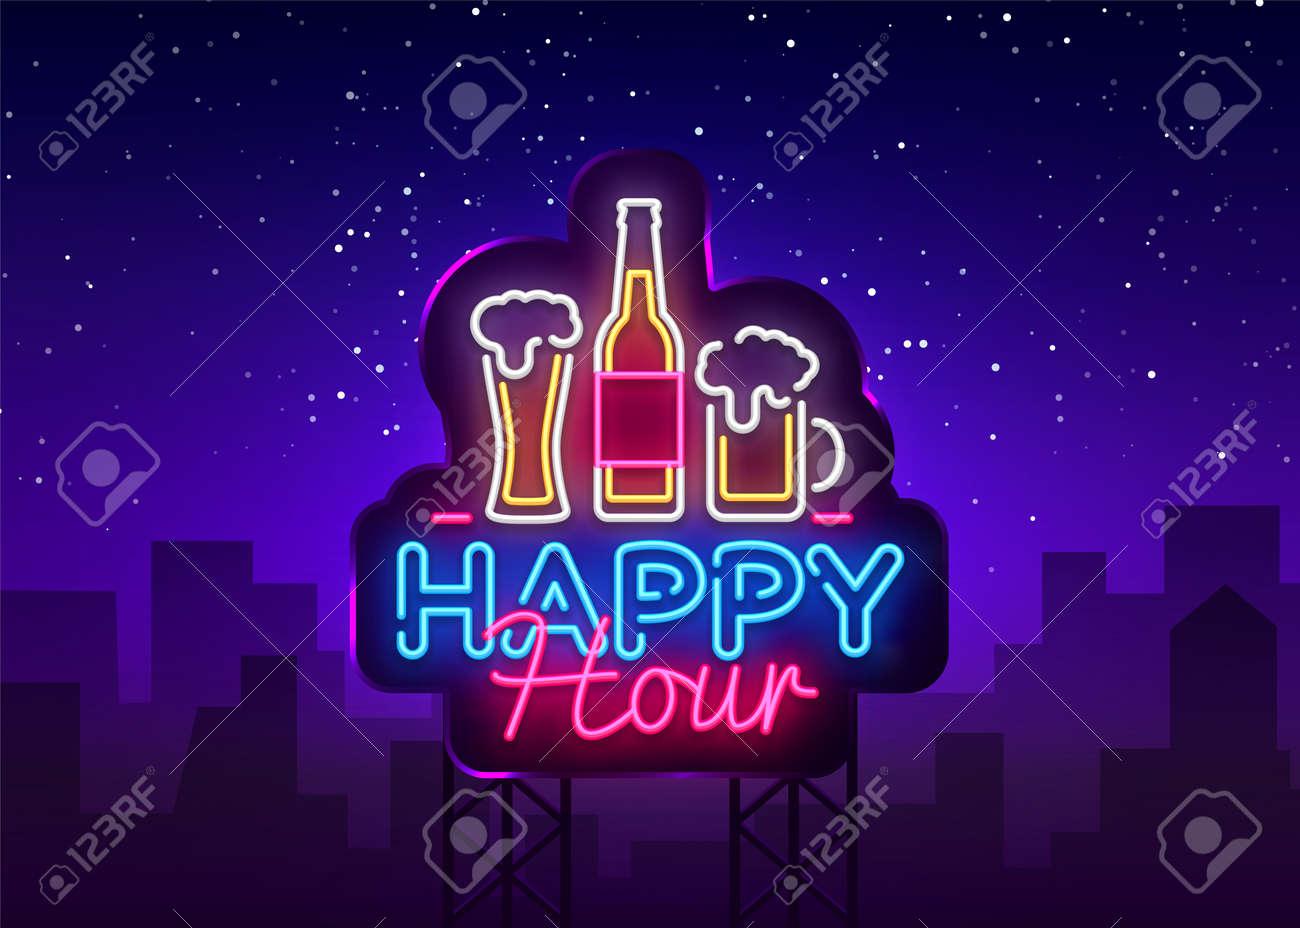 Happy Hour neon sign vector. Happy Hour Design template neon sign, Night Dinner, celebration light banner, neon signboard, nightly bright advertising, light inscription. Vector Billboards. - 112227131